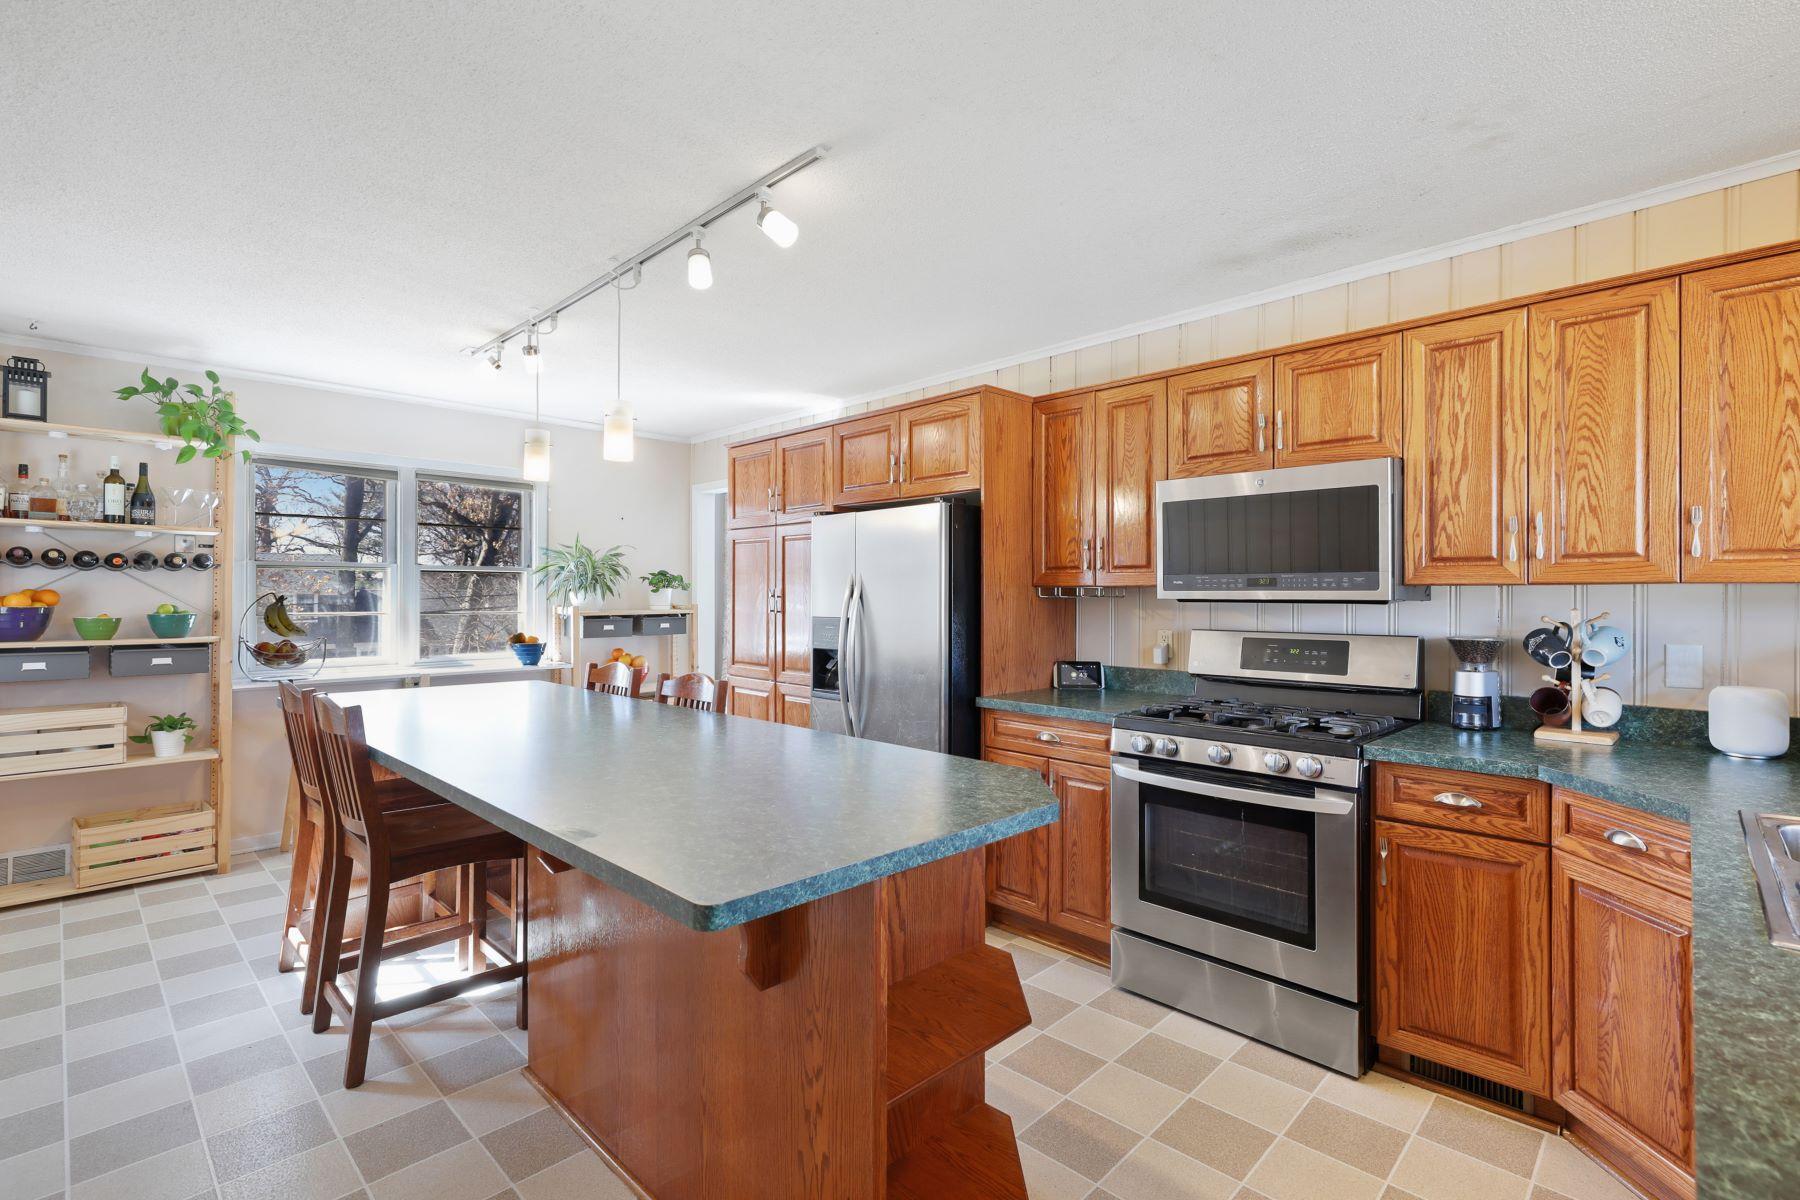 Single Family Homes por un Venta en Great Golden Valley Walk-Out Rambler Opportunity! 1525 Winnetka Ave N Golden Valley, Minnesota 55427 Estados Unidos